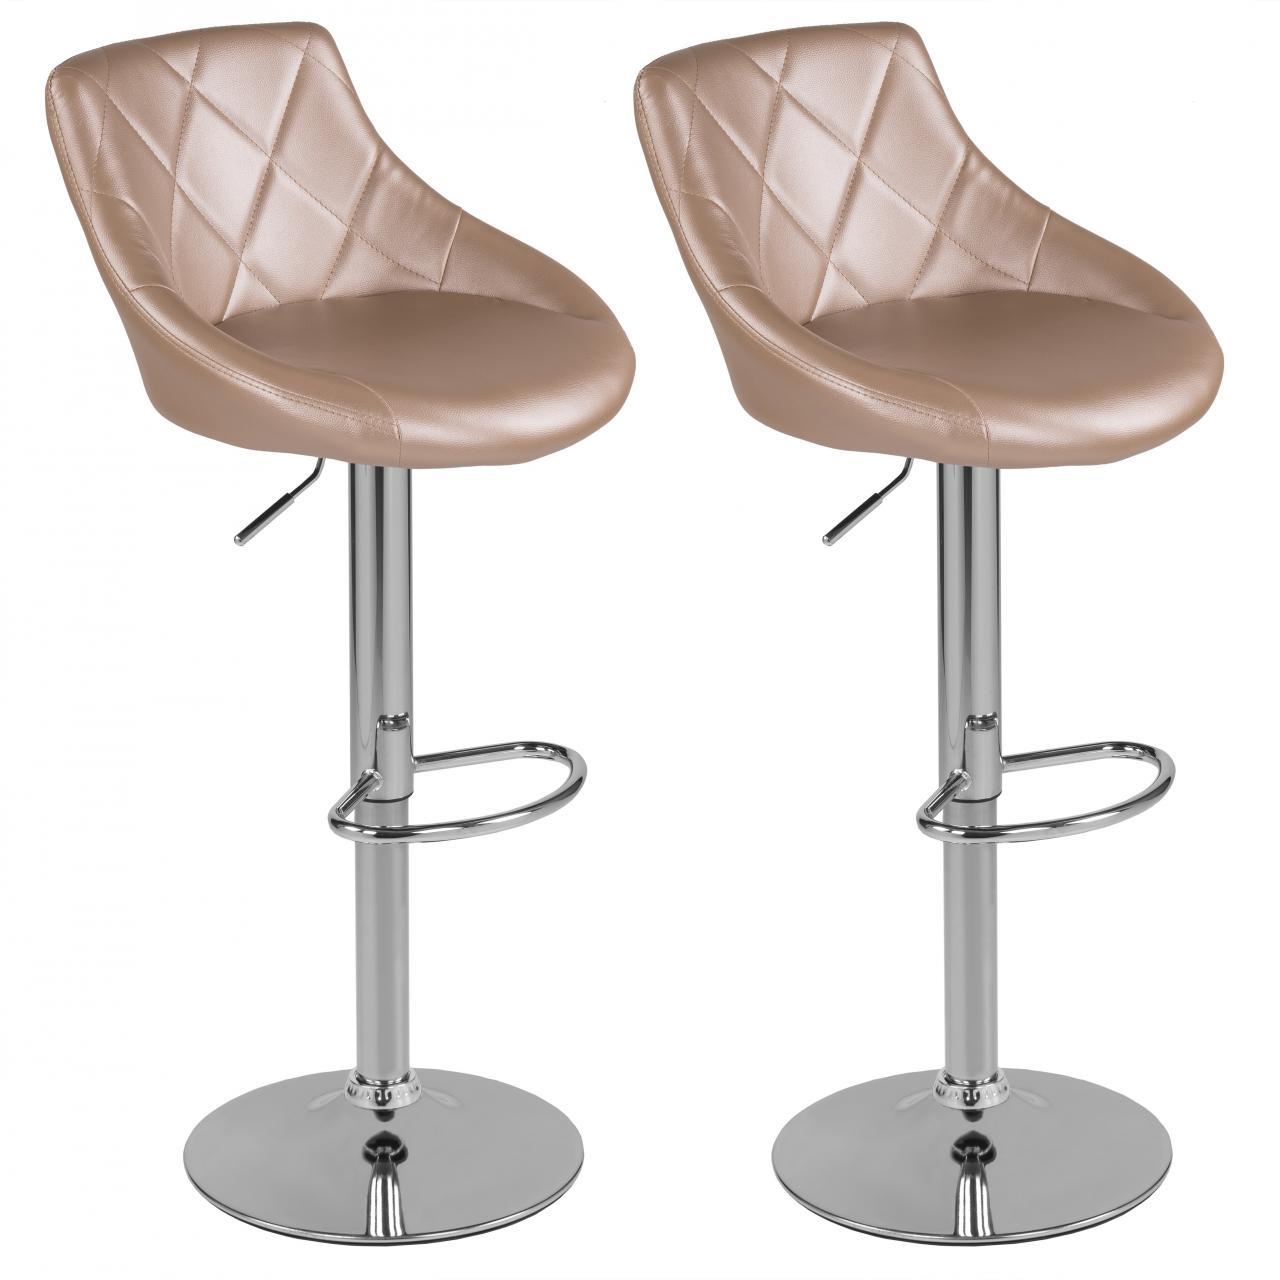 barhocker mit lehne barstuhl tresenhocker drehhocker k chenhocker stuhl bar set ebay. Black Bedroom Furniture Sets. Home Design Ideas